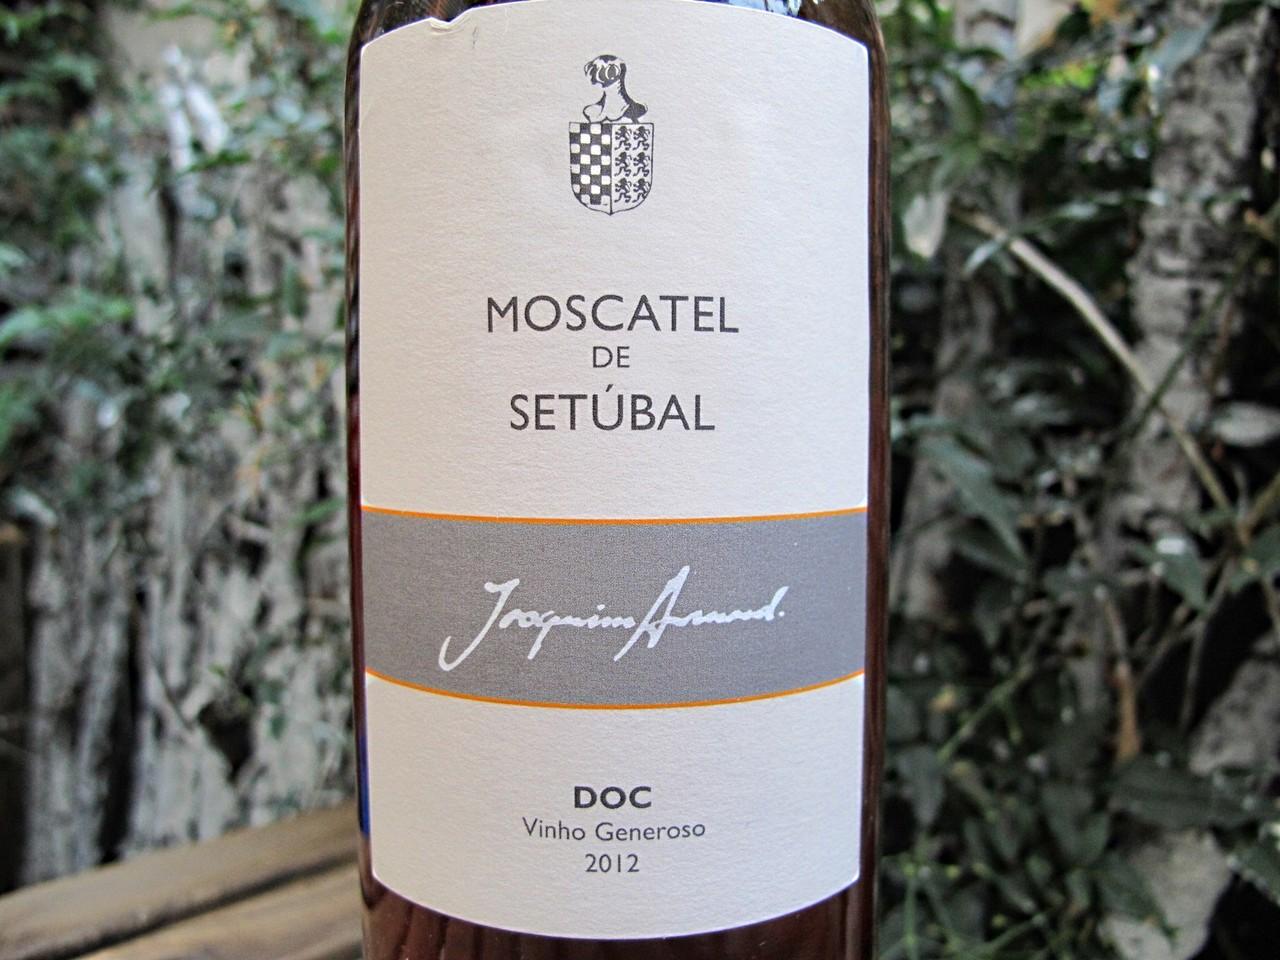 Moscatel de Setúbal Joaquim Arnaud